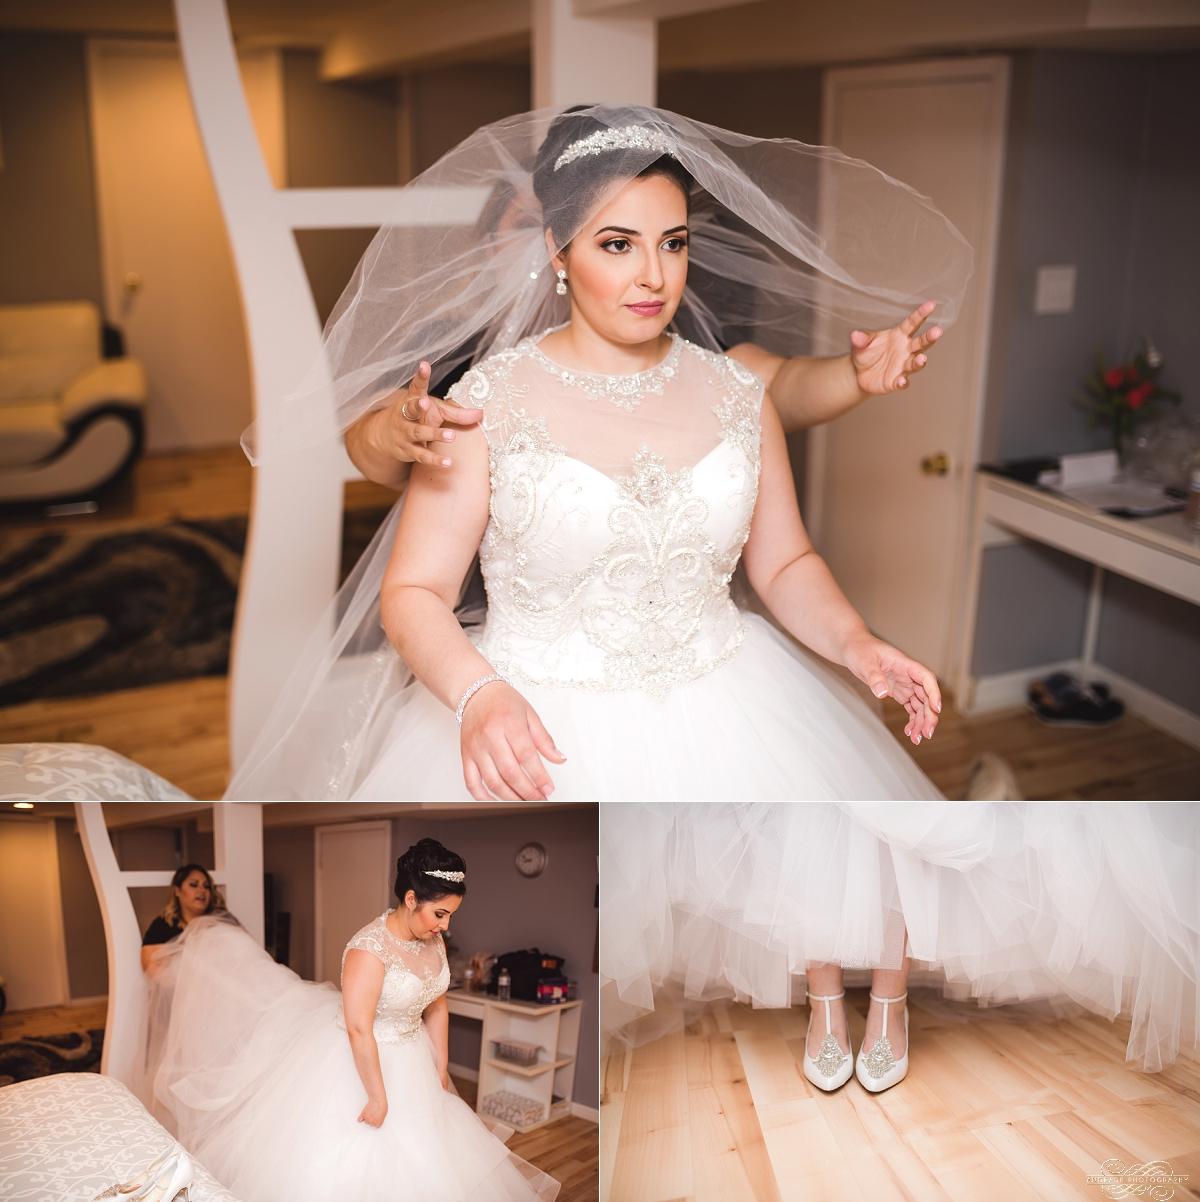 Venutis Banquet Chicago Illinois Wedding Photography 1 (16).jpg